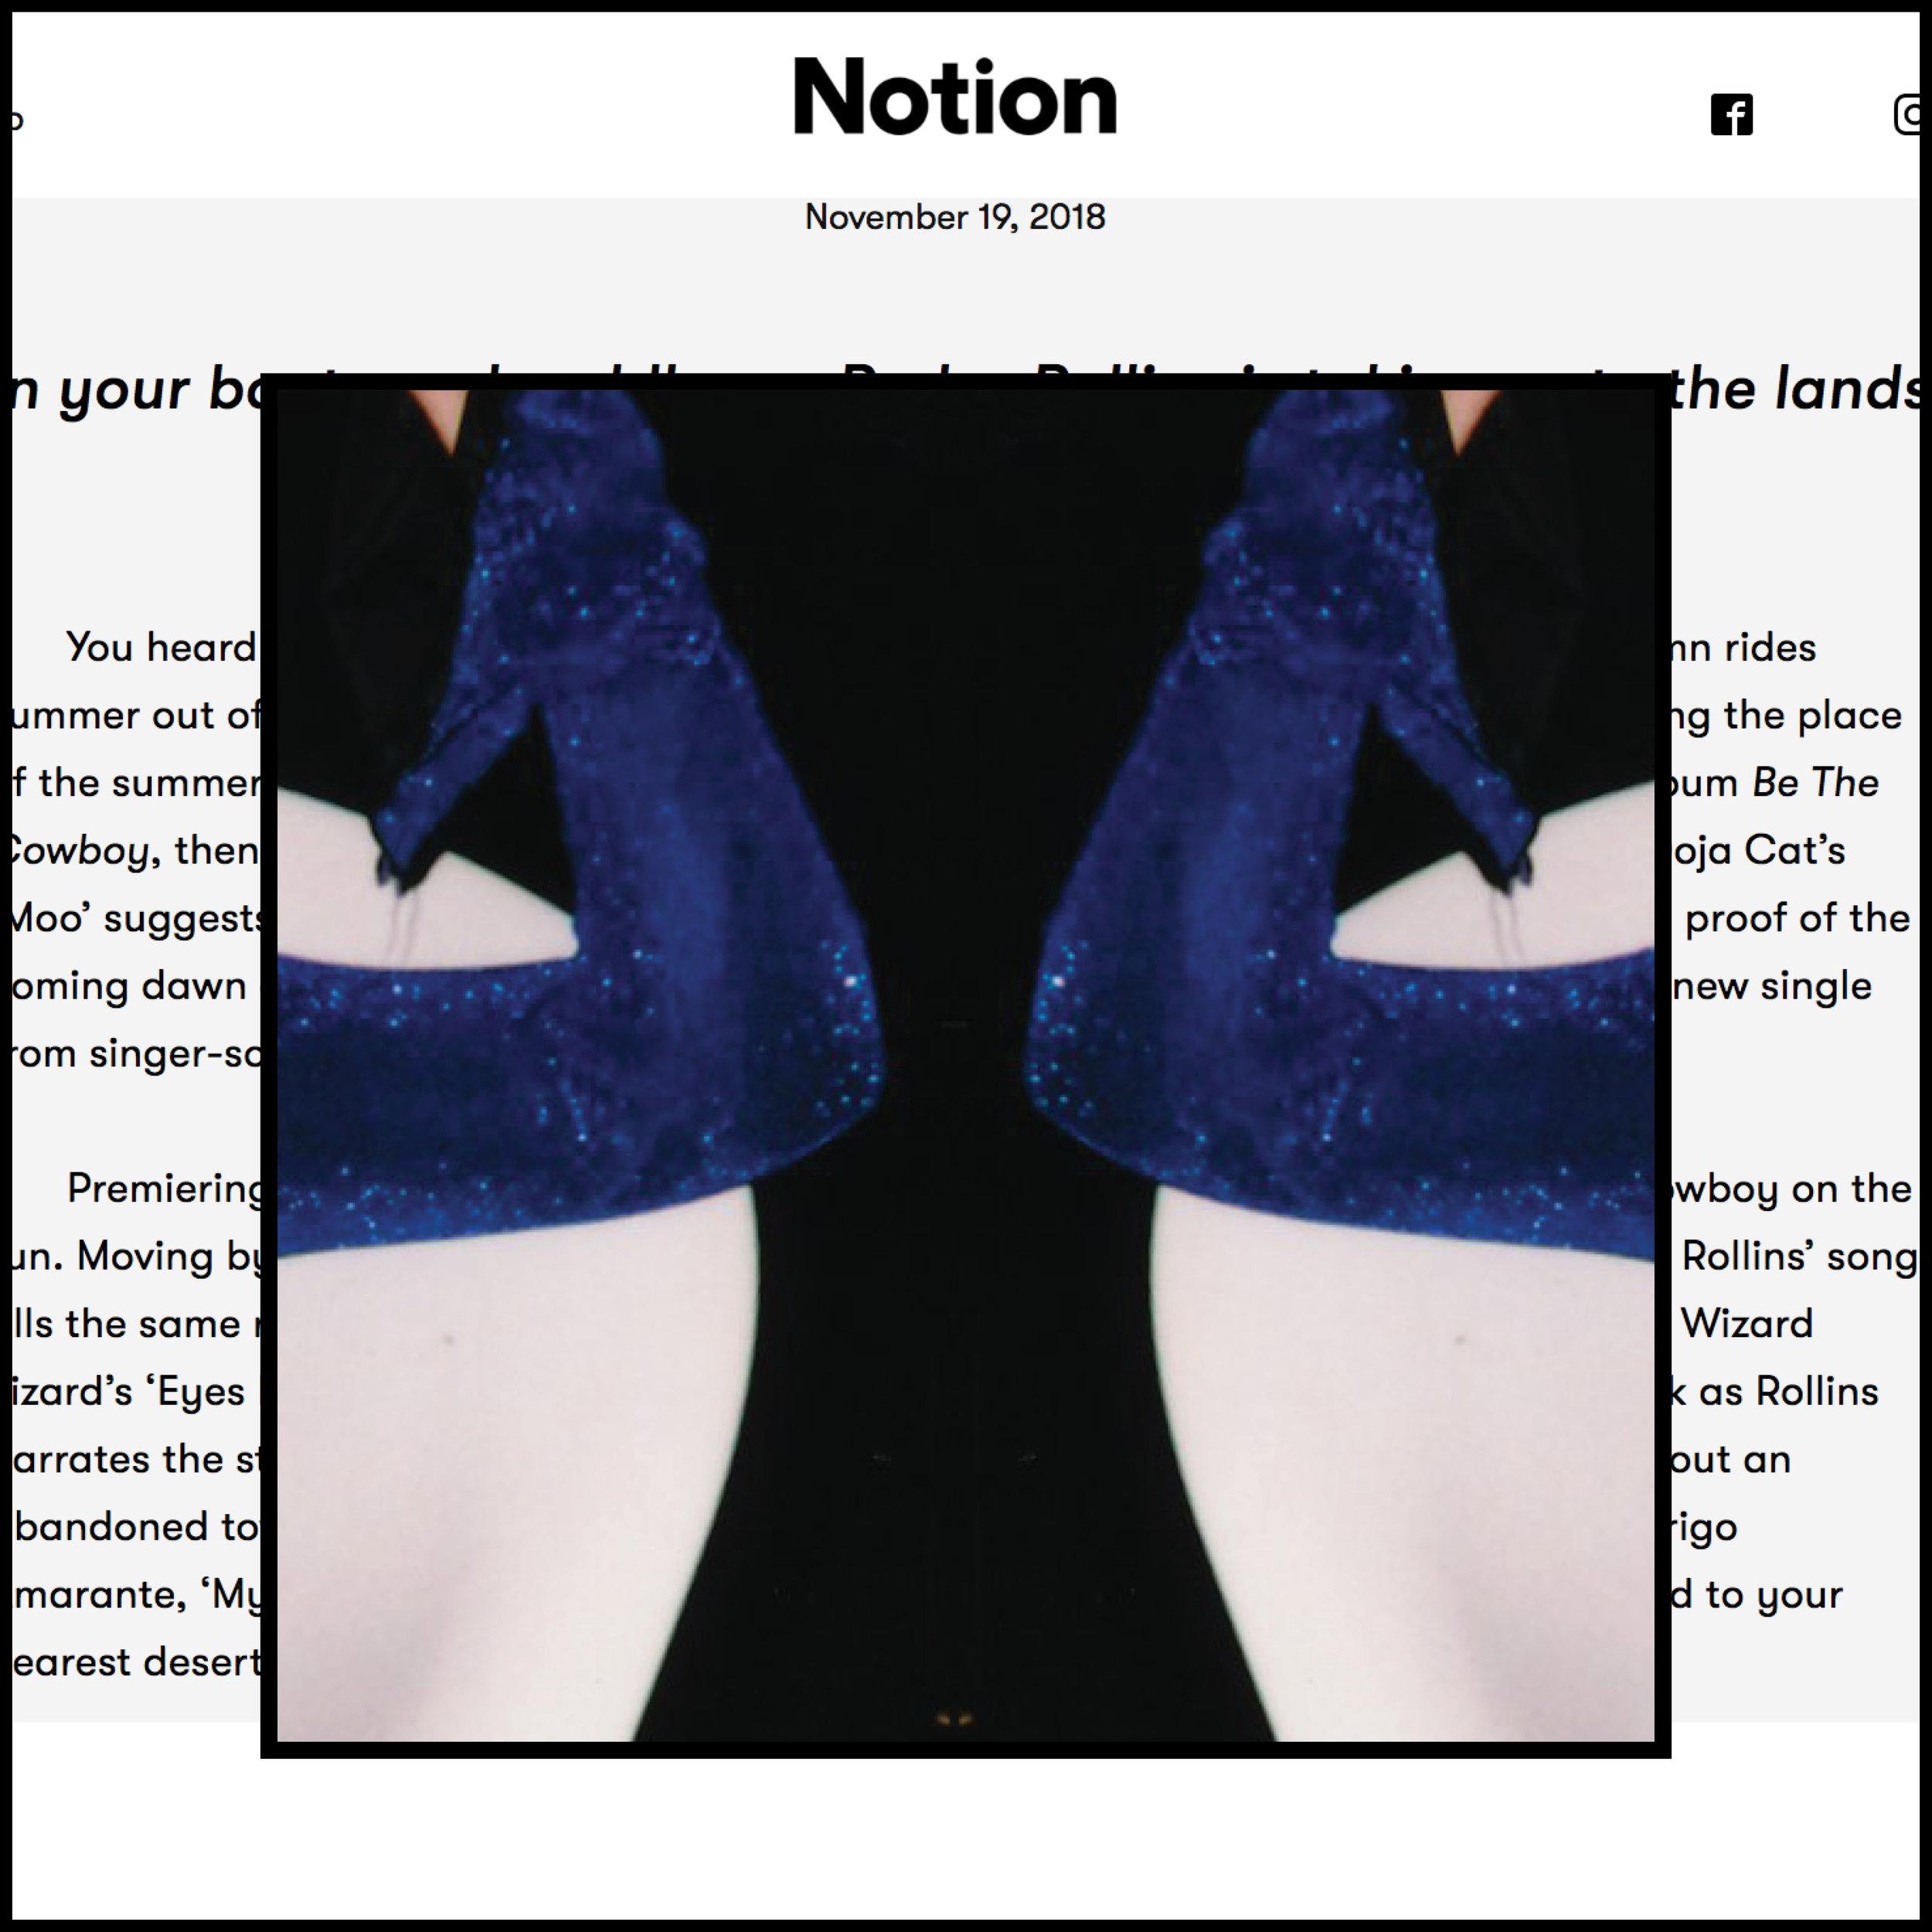 Link -  Notion